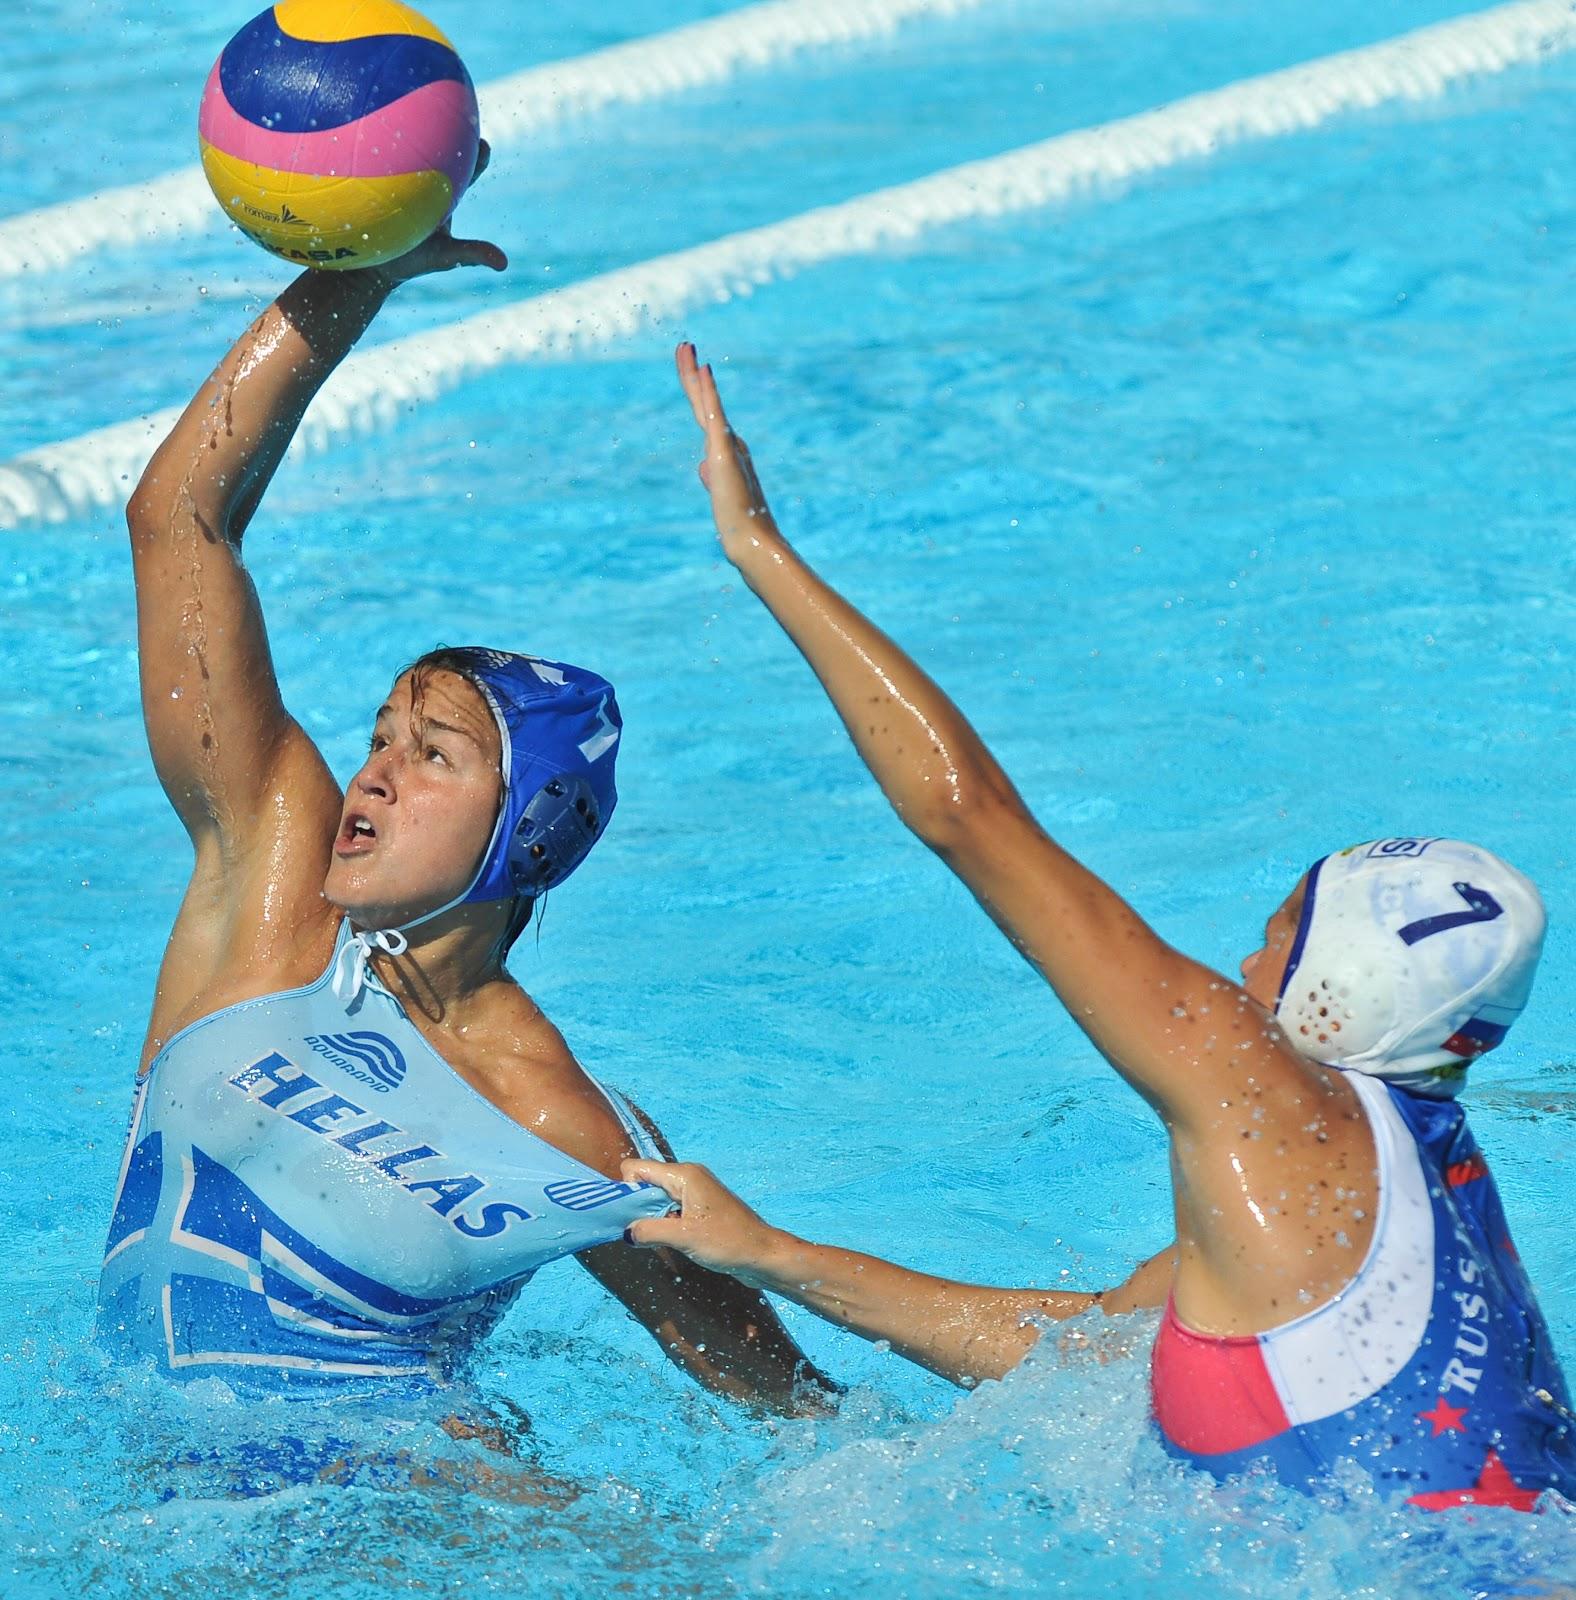 Ladies water polo breast slip compilation 100 - Swimming pool wardrobe malfunction pics ...